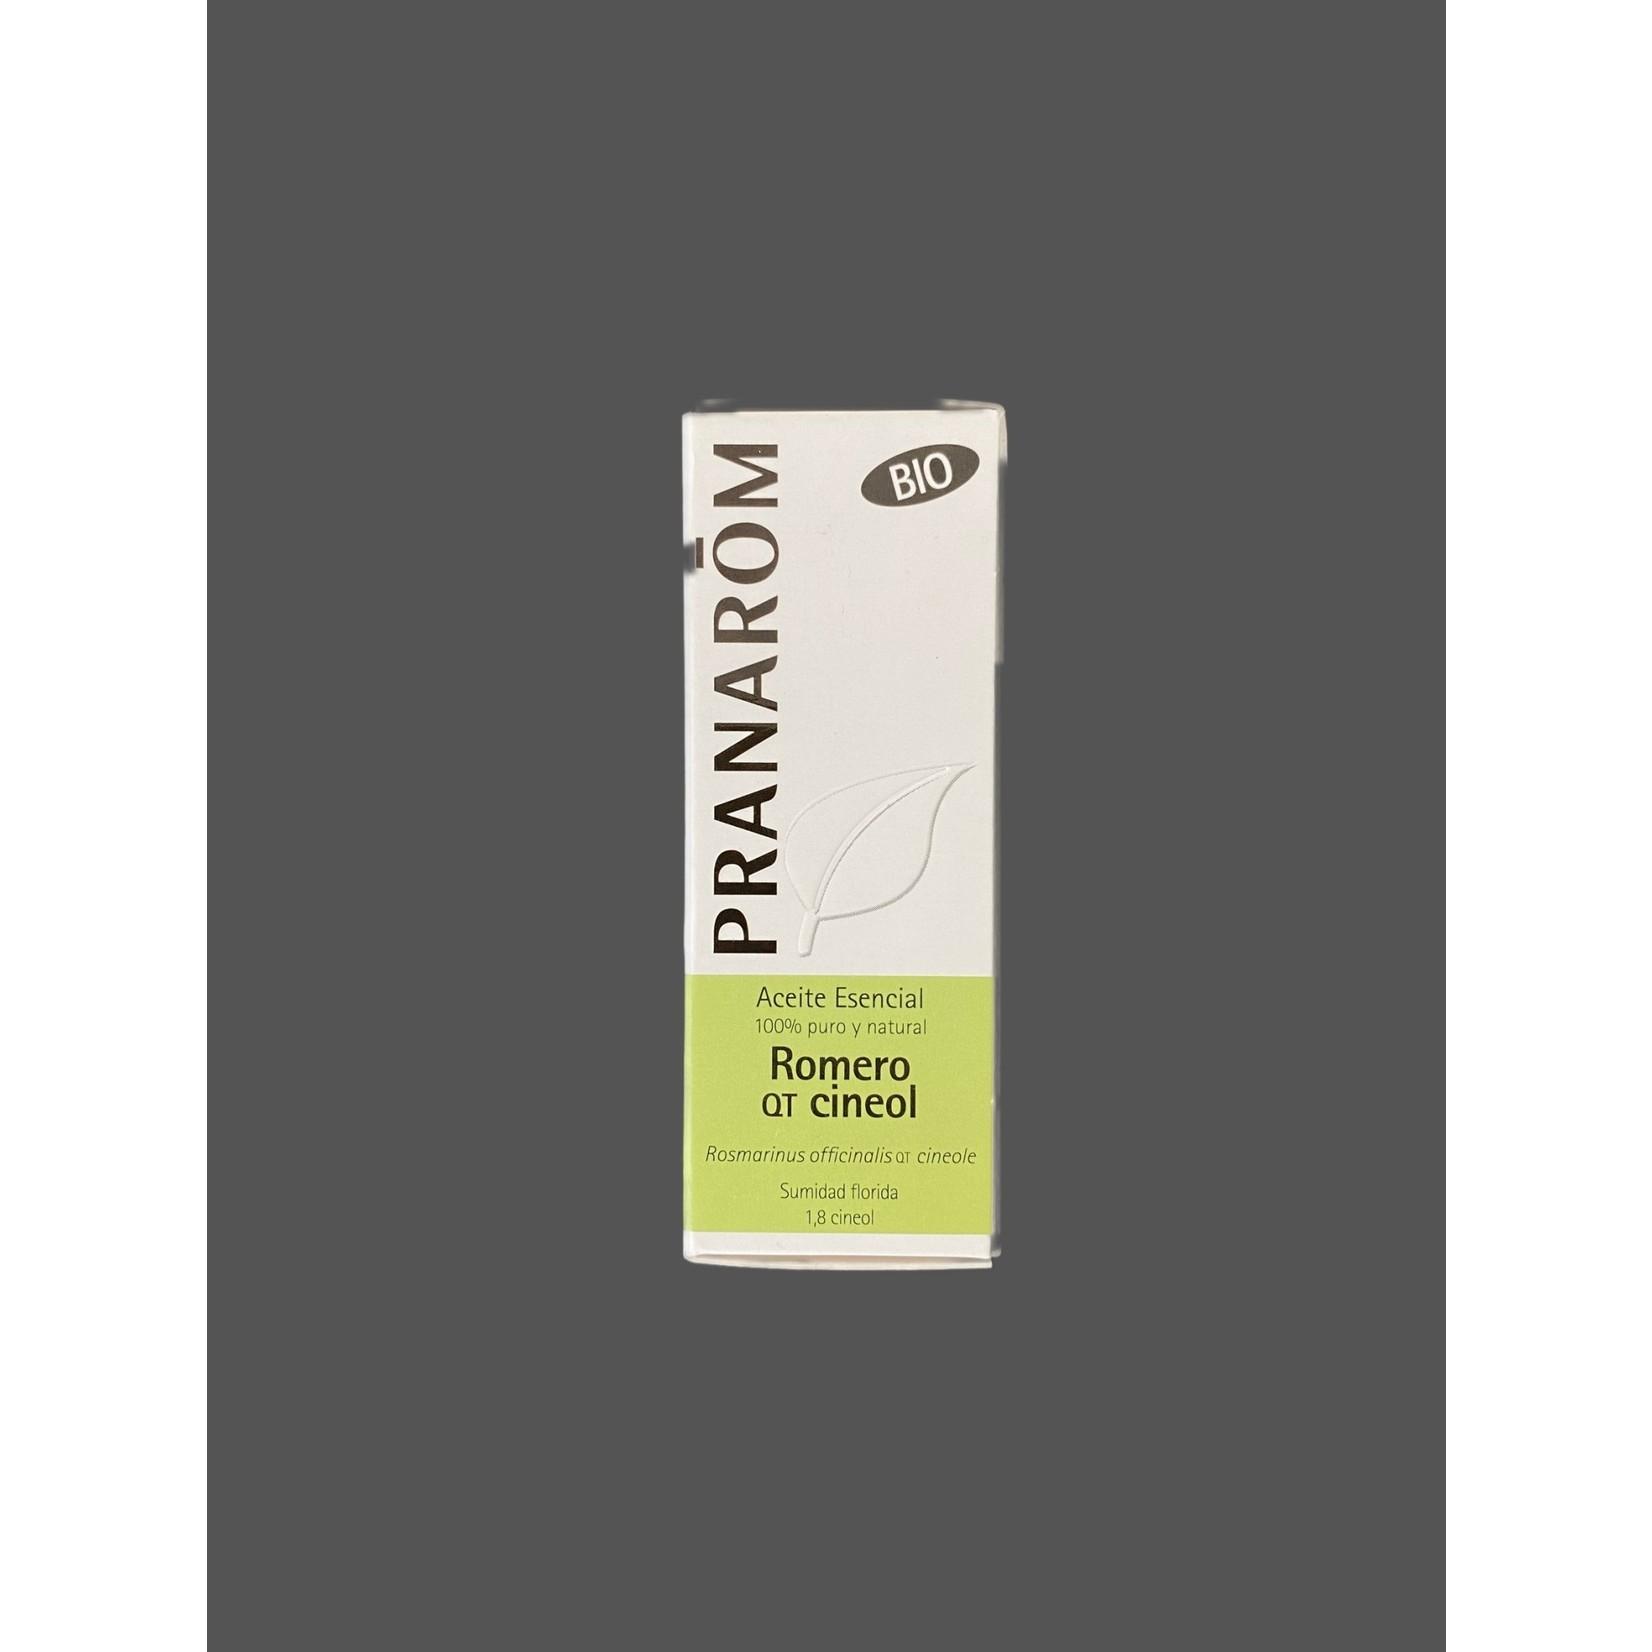 Aceite esencial Romero Pranarom BIO